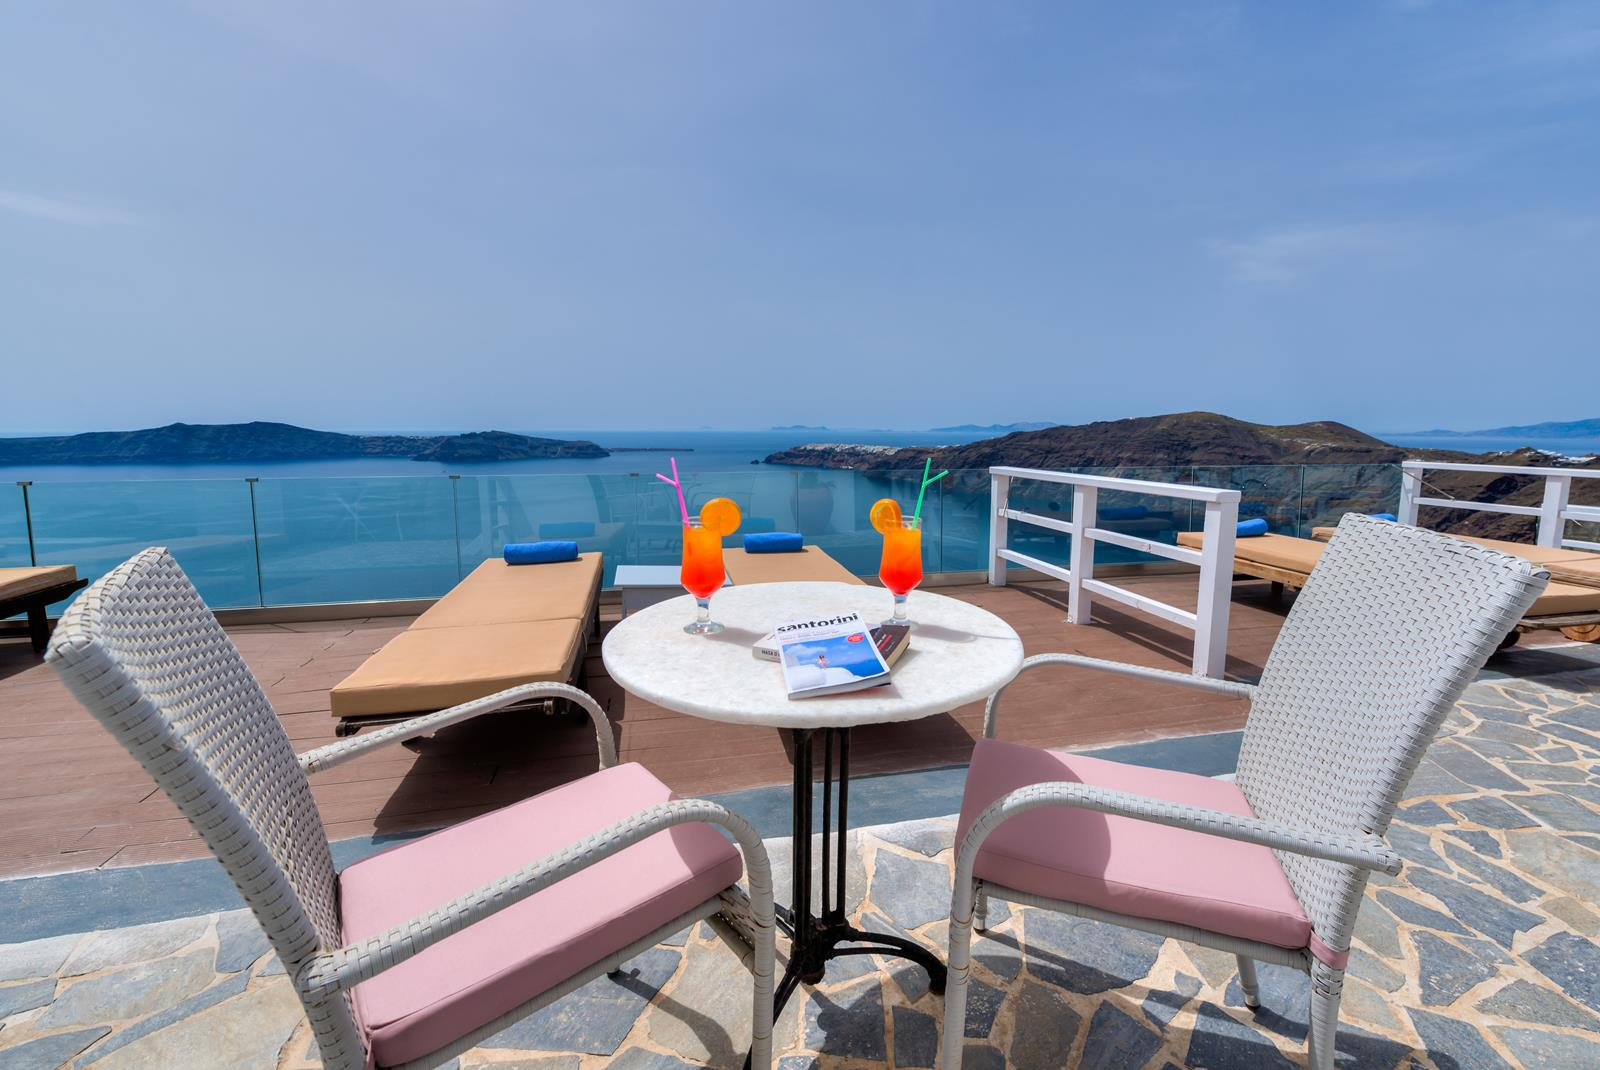 santorini stay - Gizis Exclusive Santorini Greece